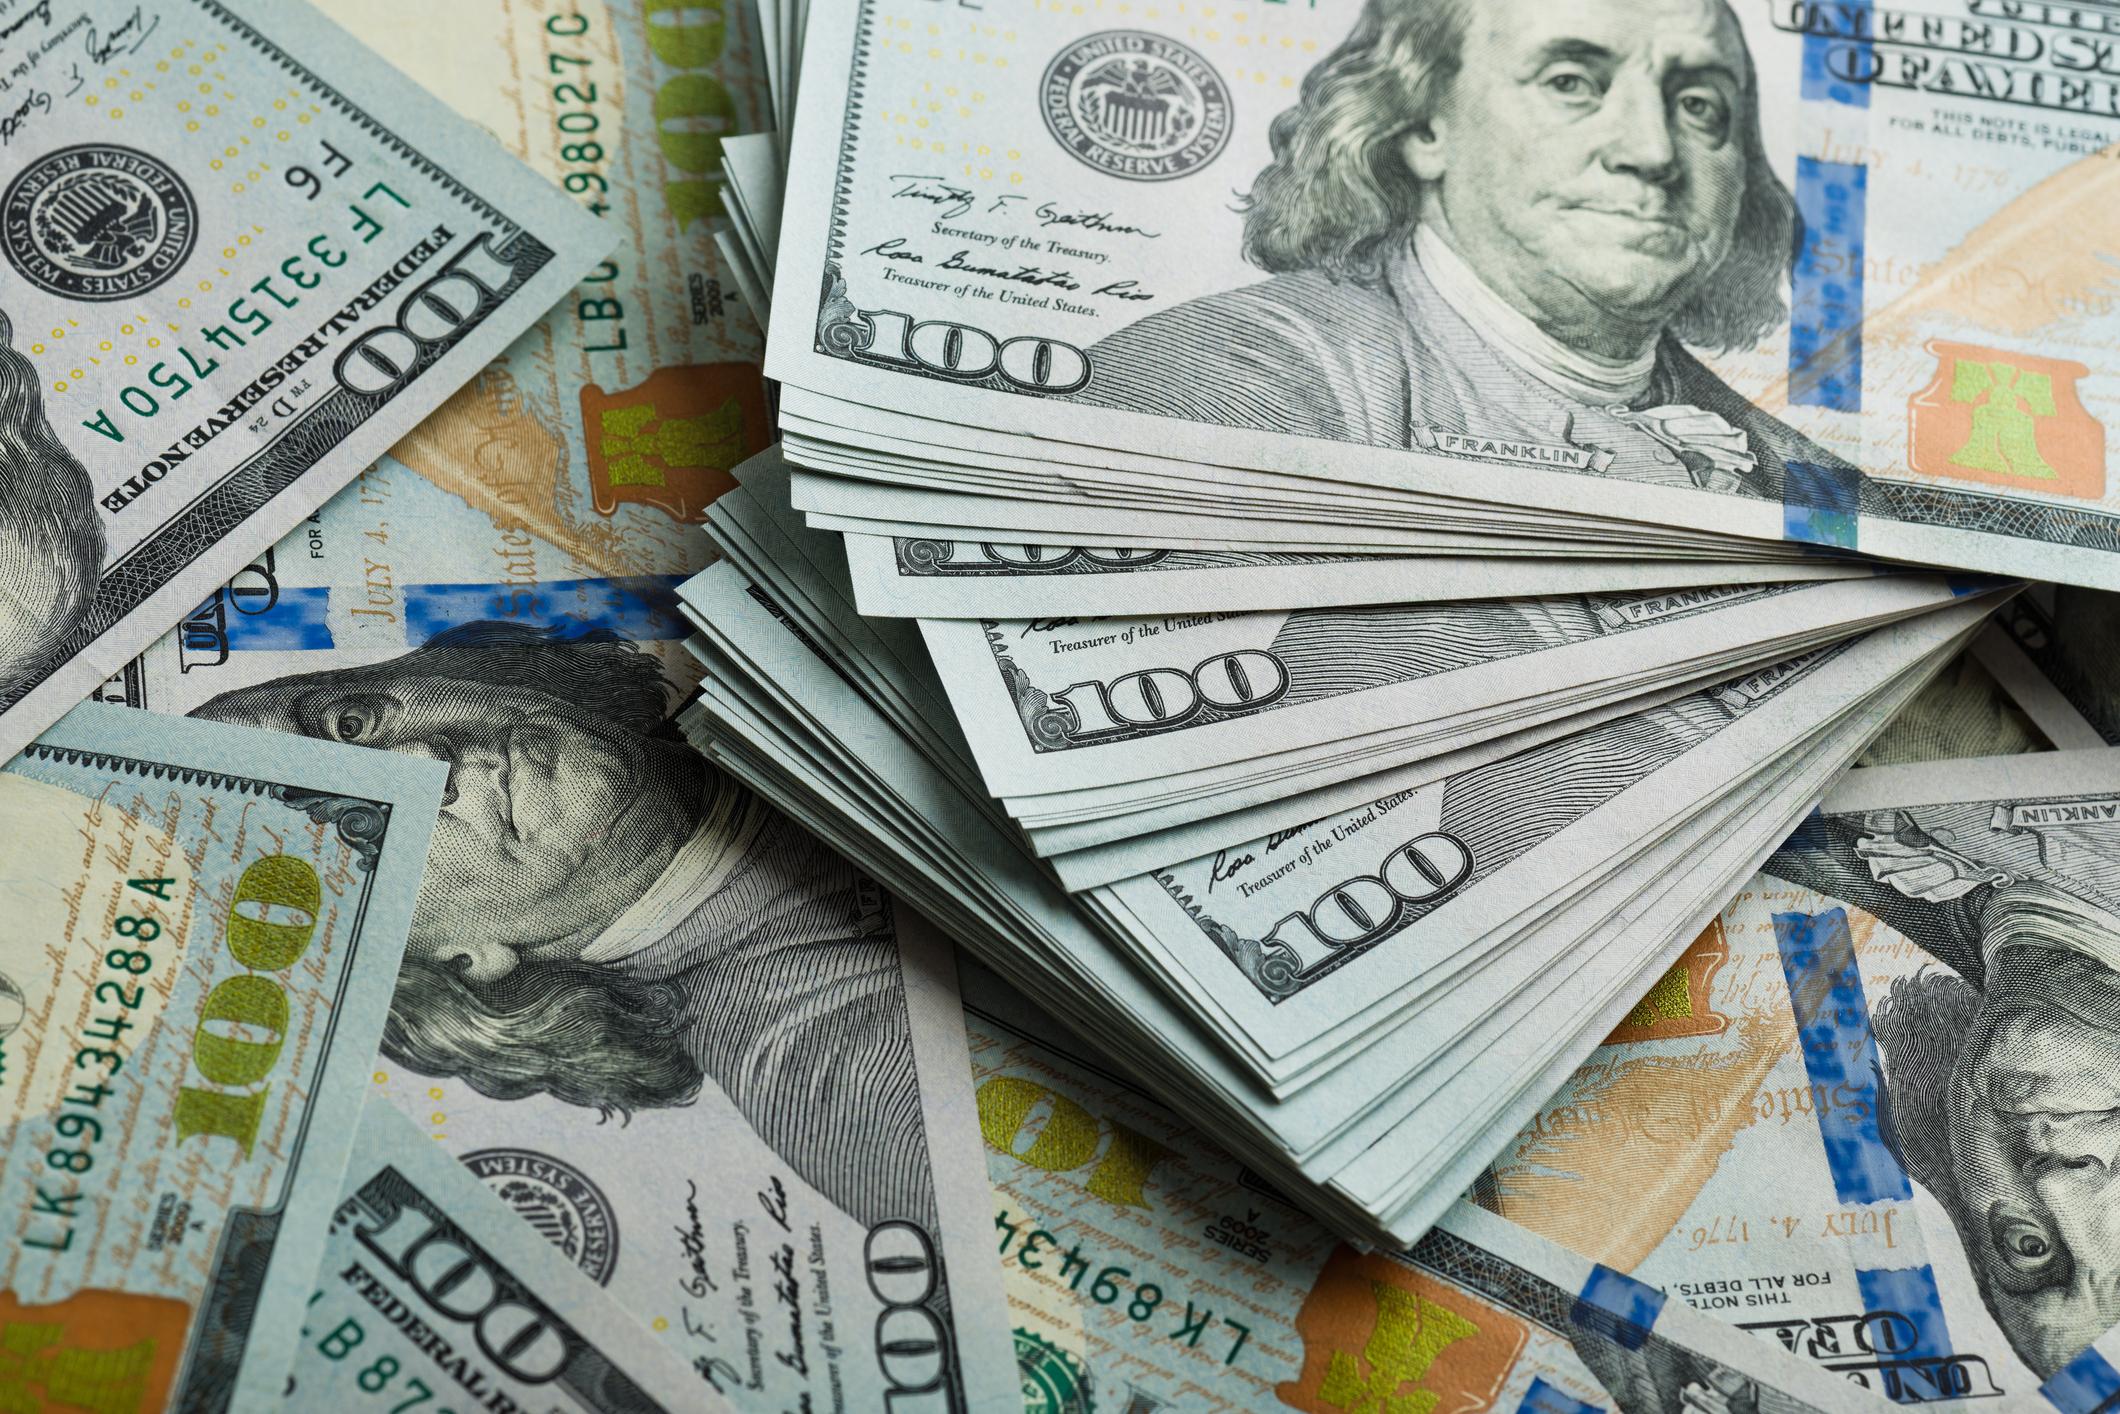 large pile of hundred dollar bills